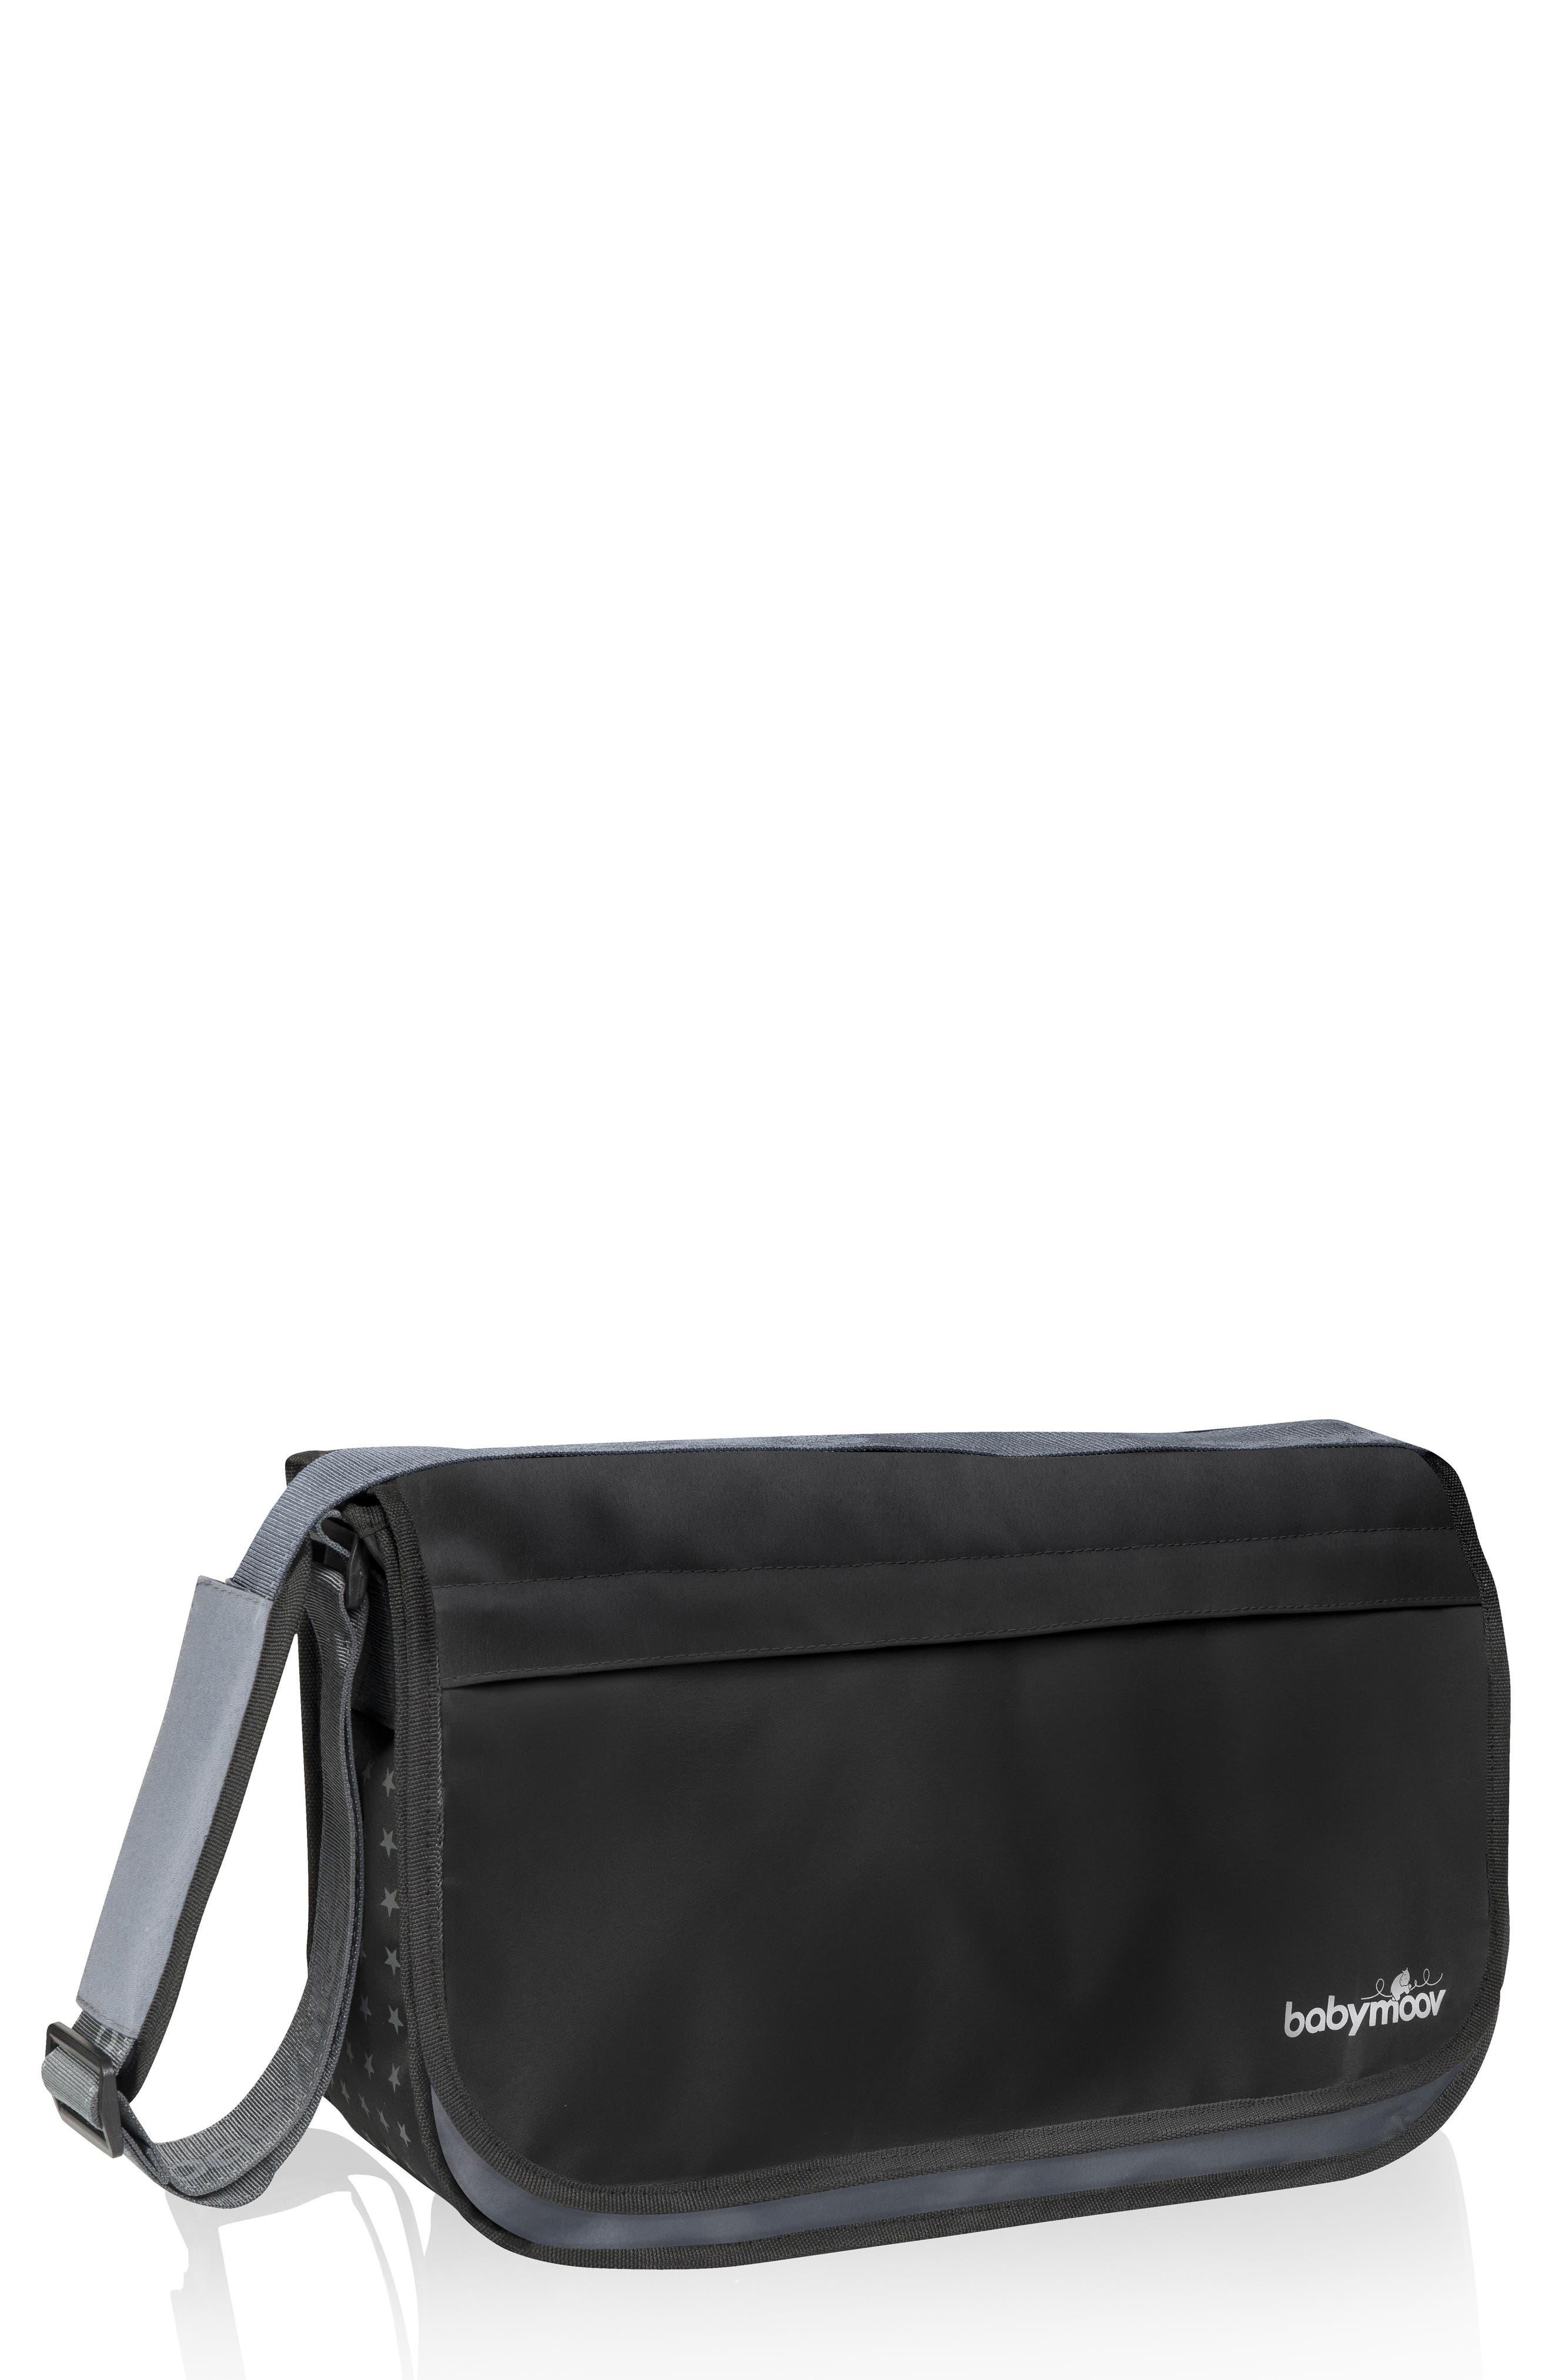 BABYMOOV Messenger Diaper Bag, Main, color, 001